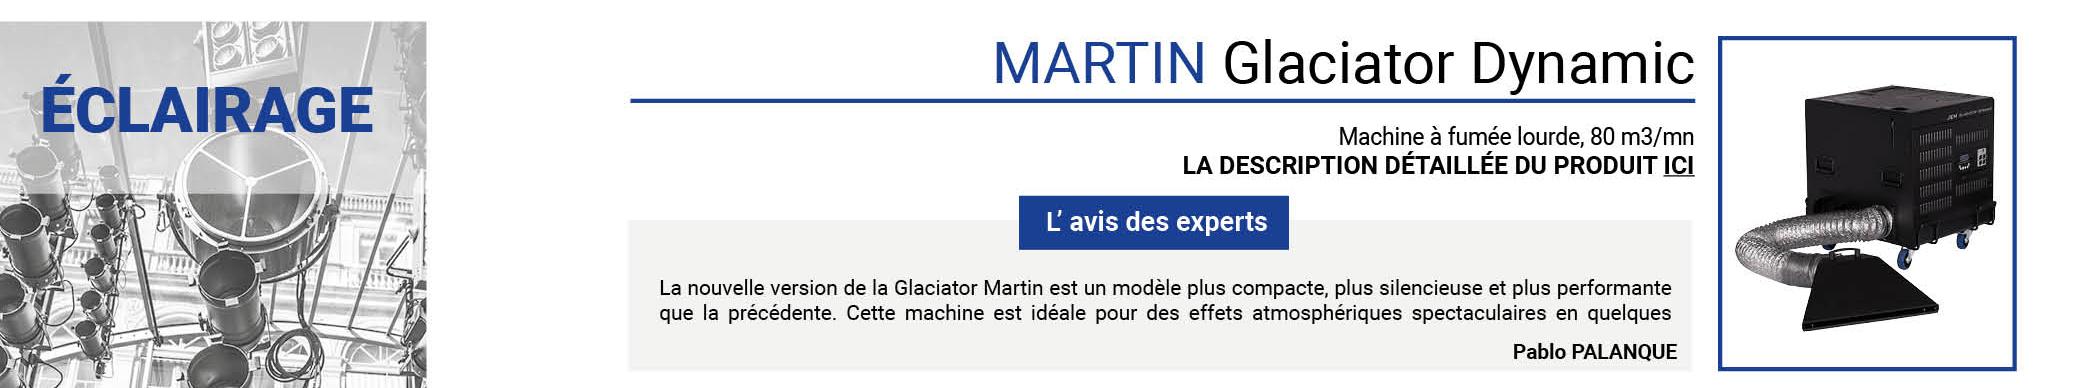 MARTIN Glaciator Dynamic